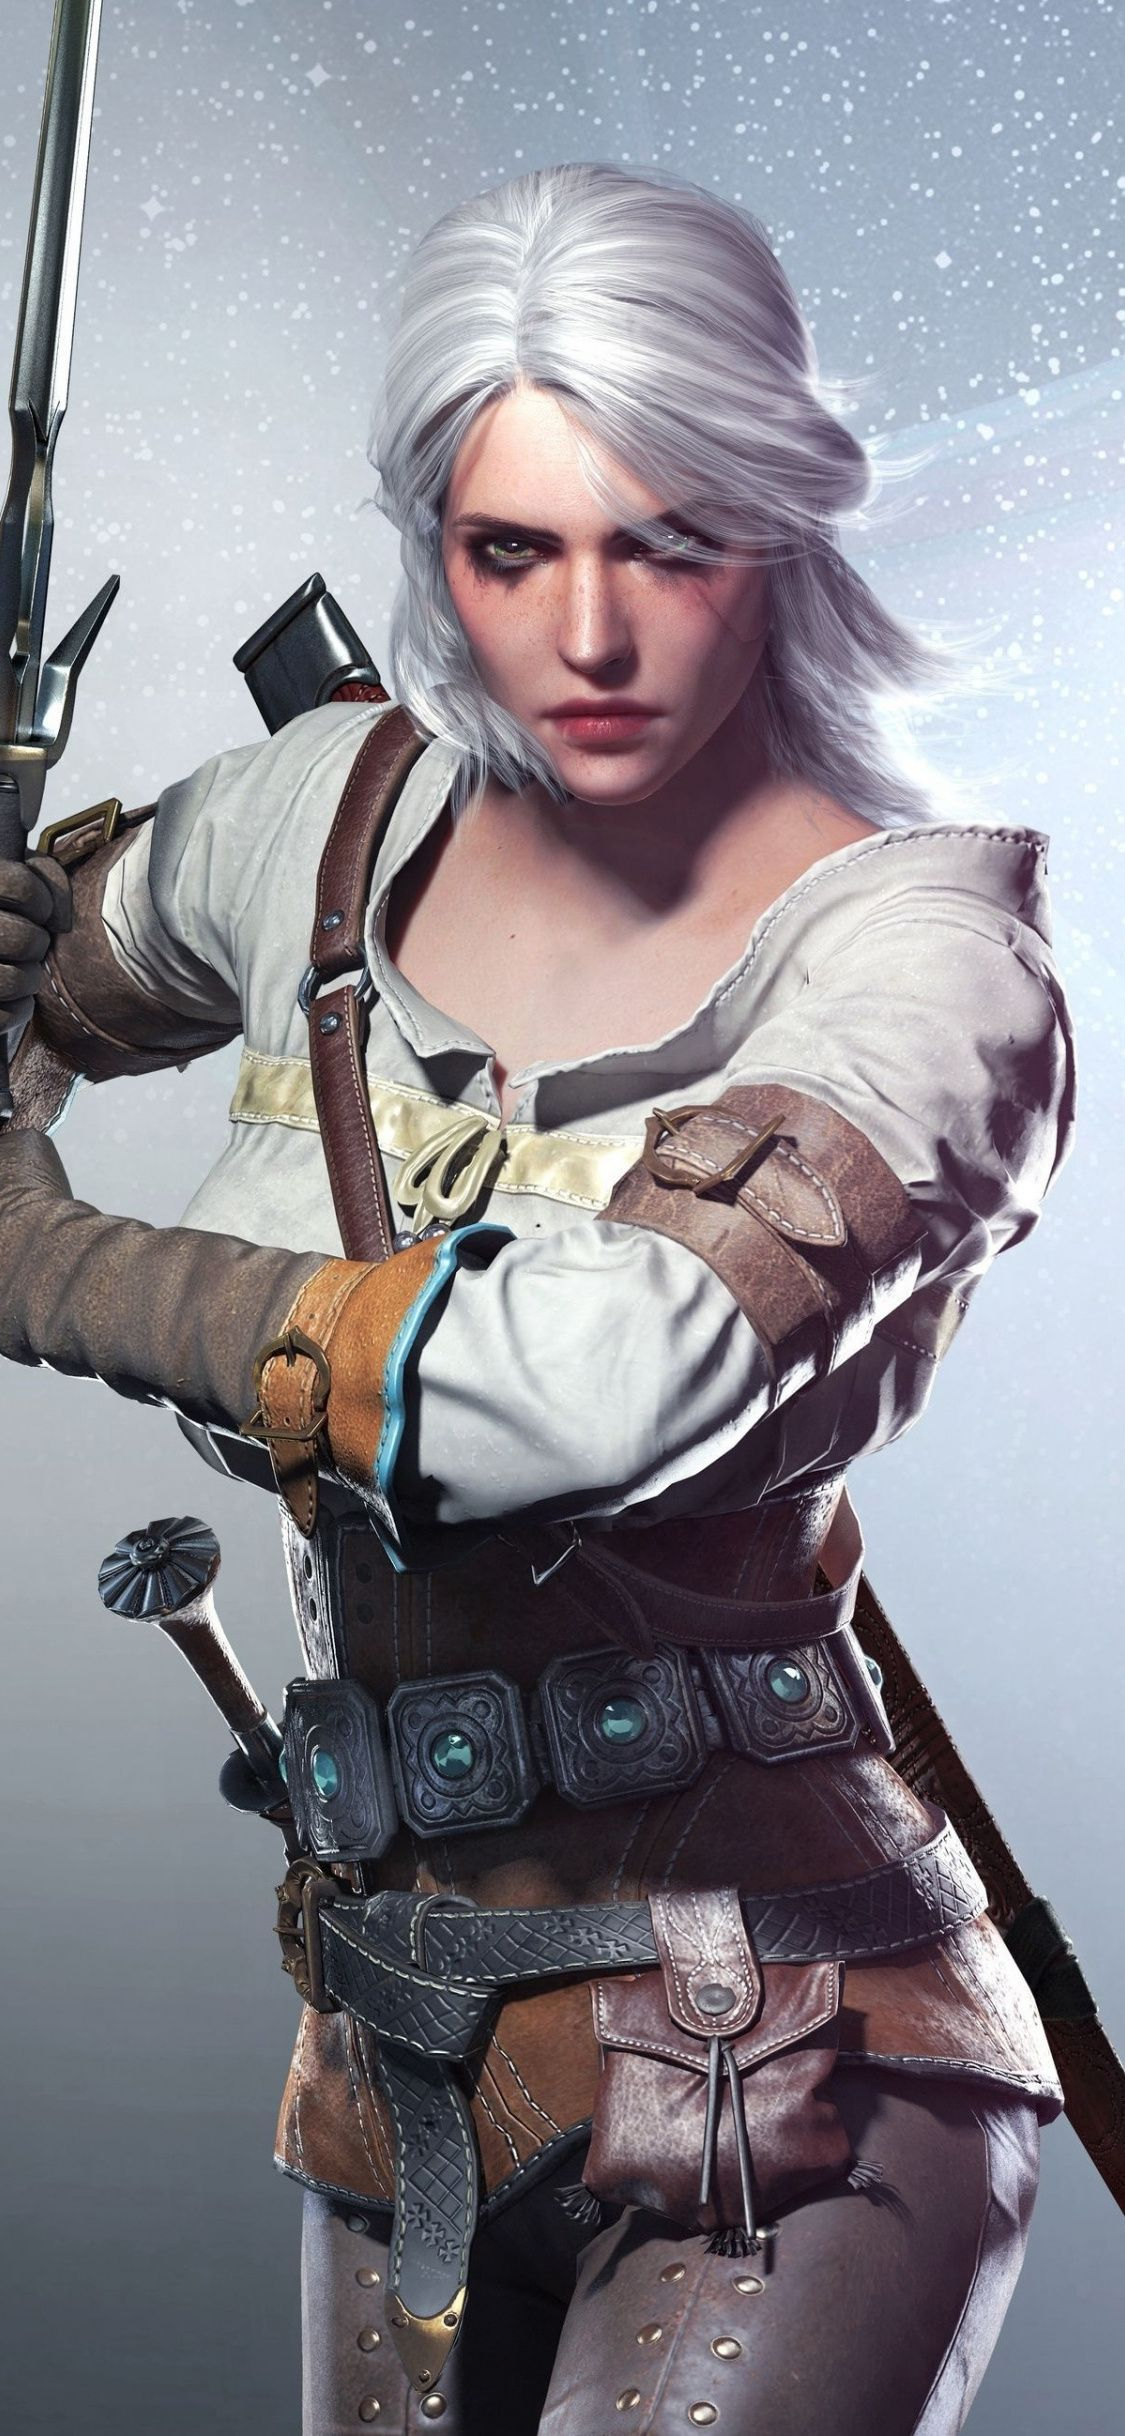 Ciri, The Witcher, video game, artwork, 1125x2436 wallpaper